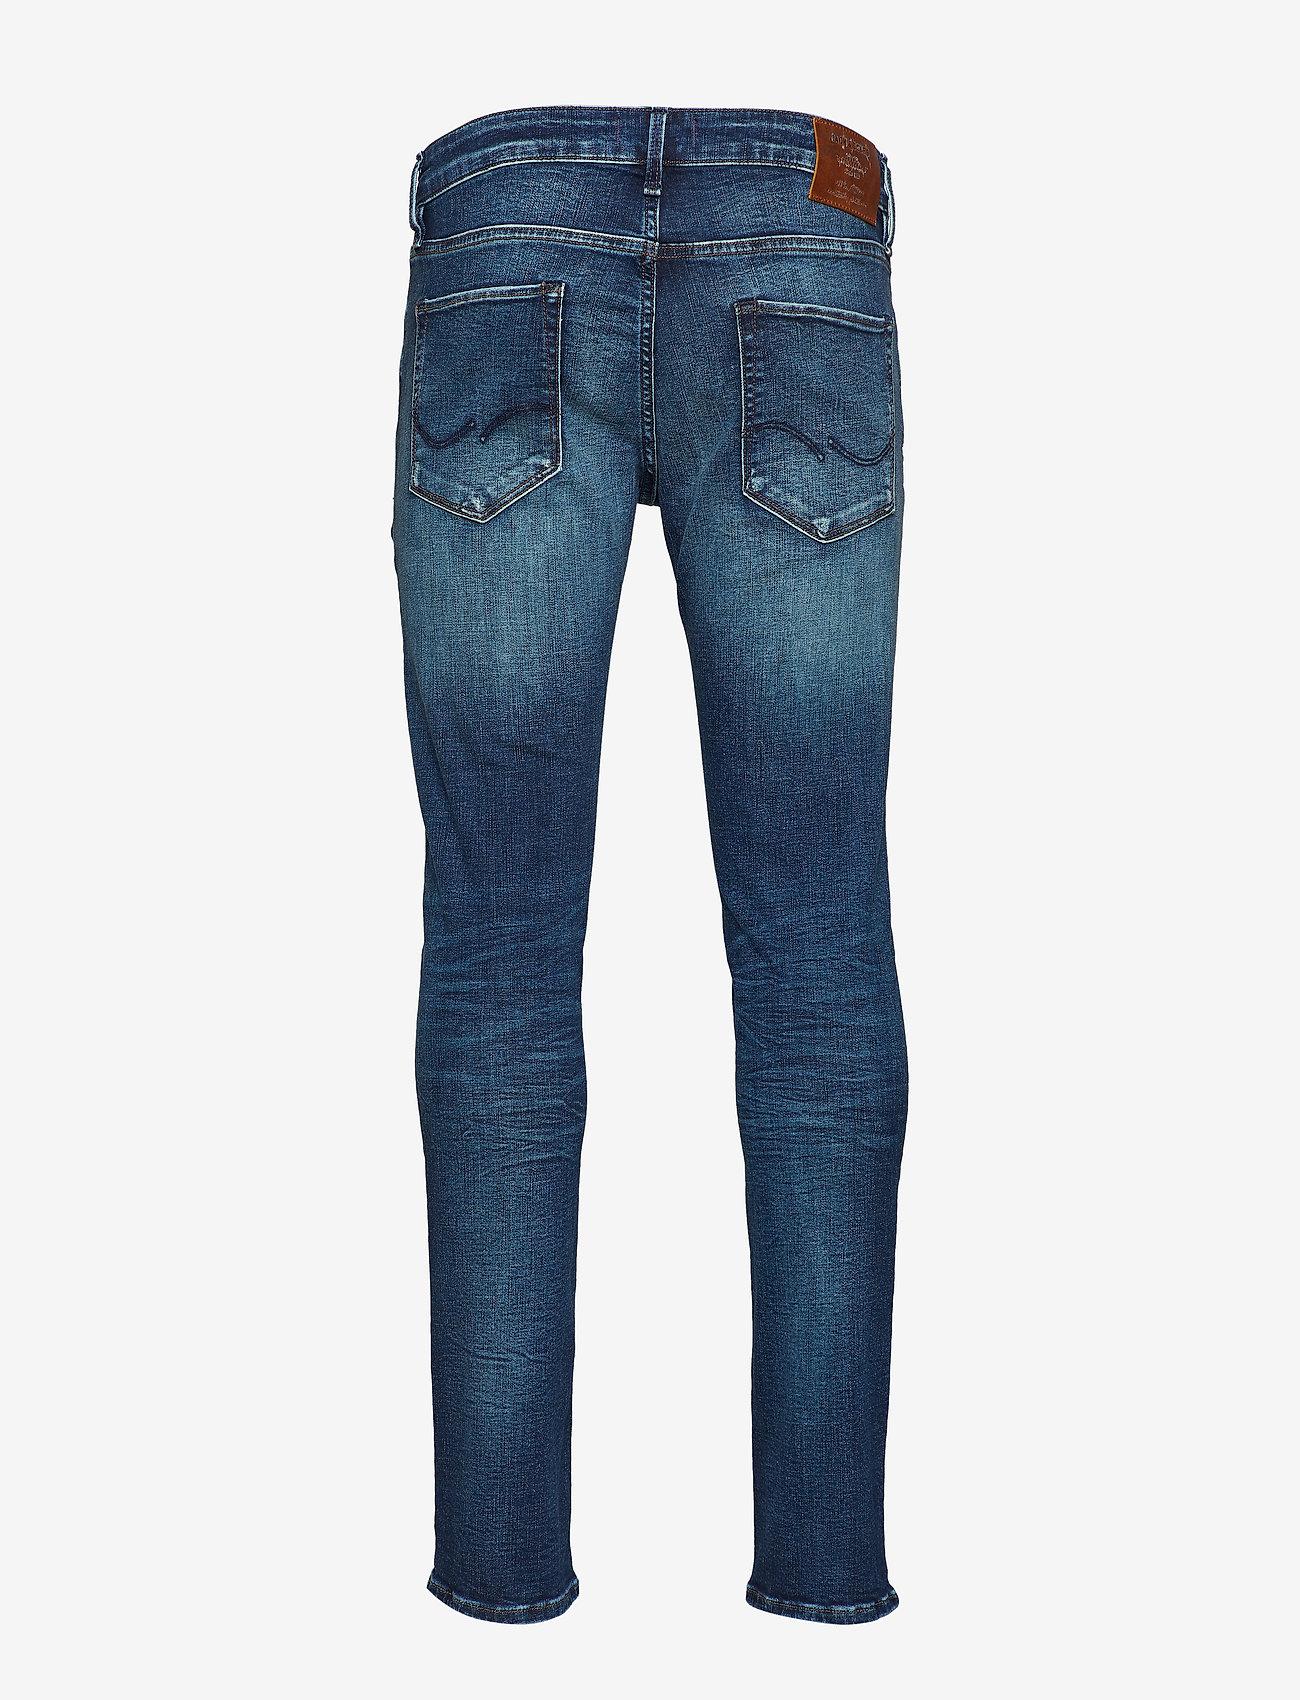 Jack & Jones - JJIGLENN JJICON JOS 424 50SPS NOOS - slim jeans - blue denim - 1